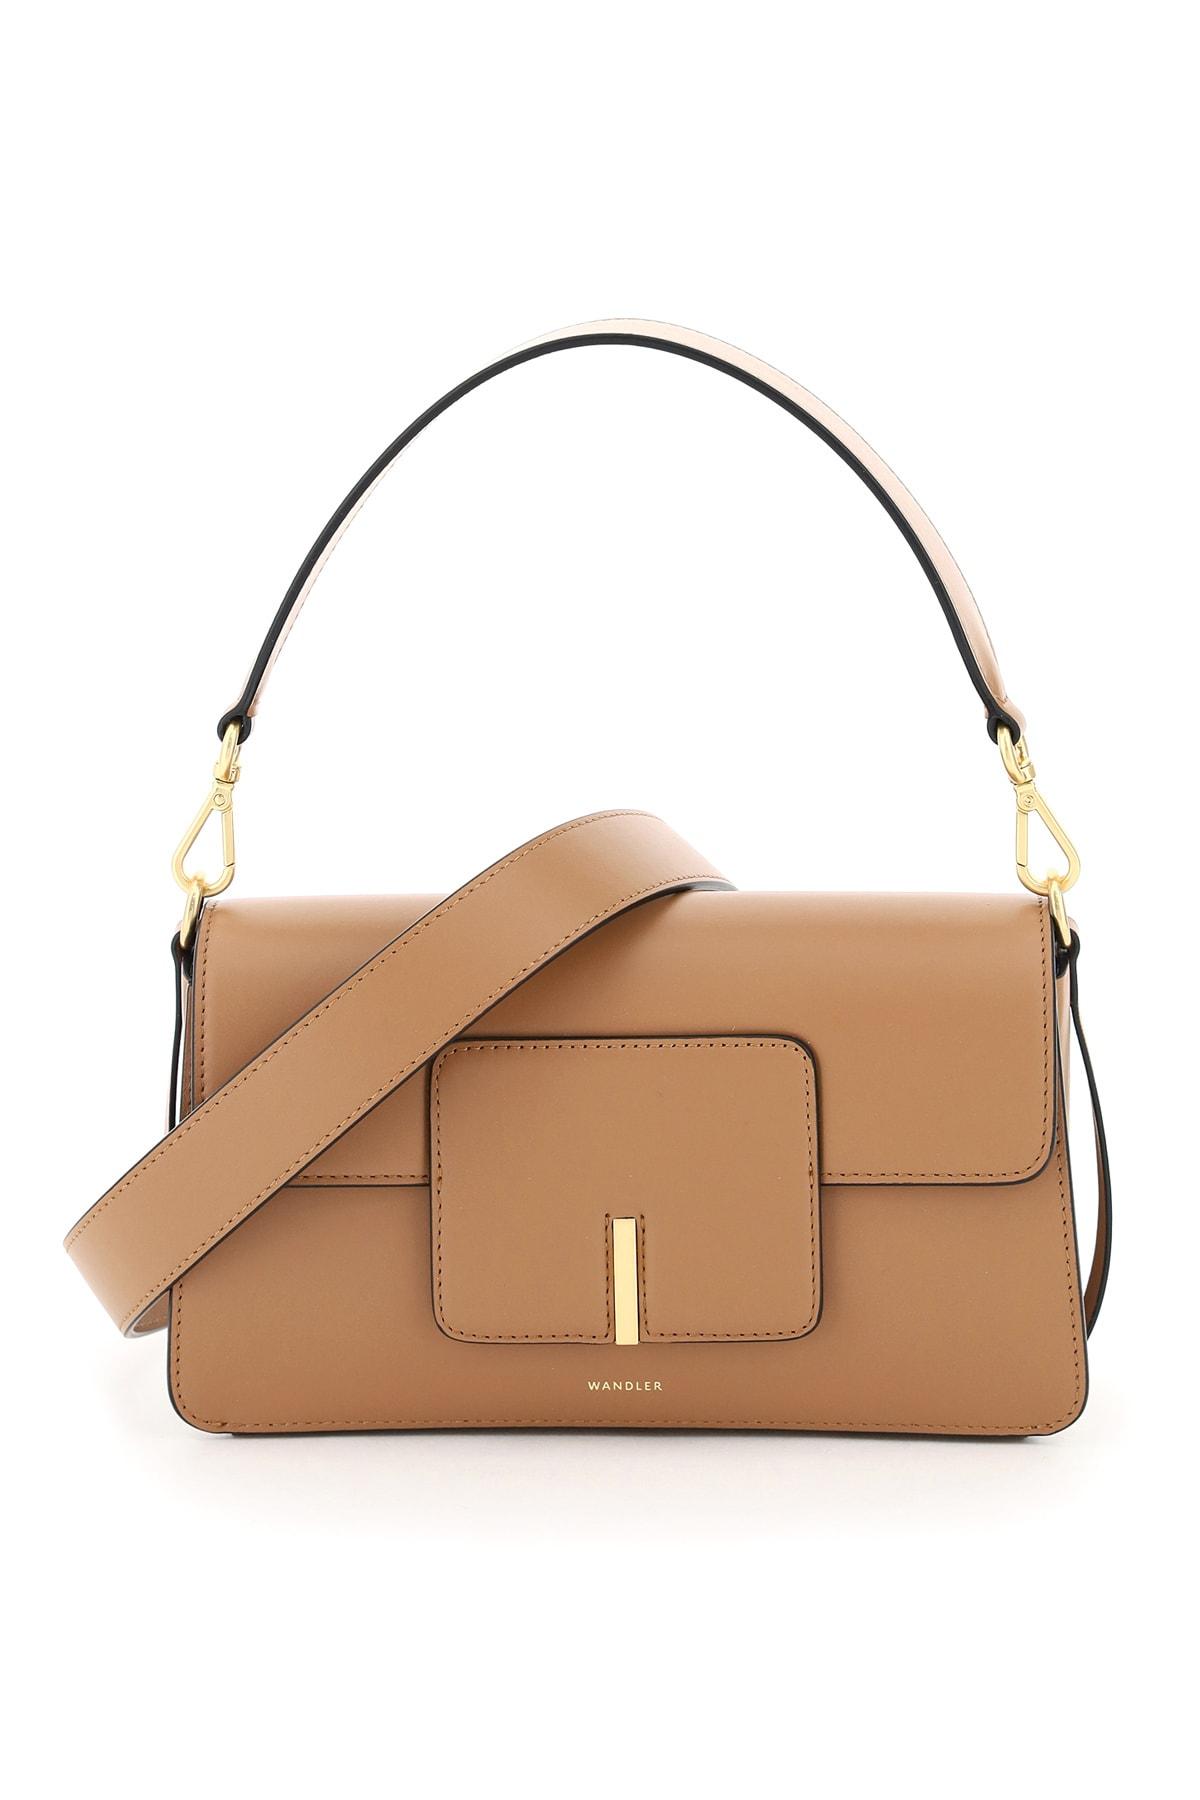 Wandler Bags GEORGIA LEATHER BAG